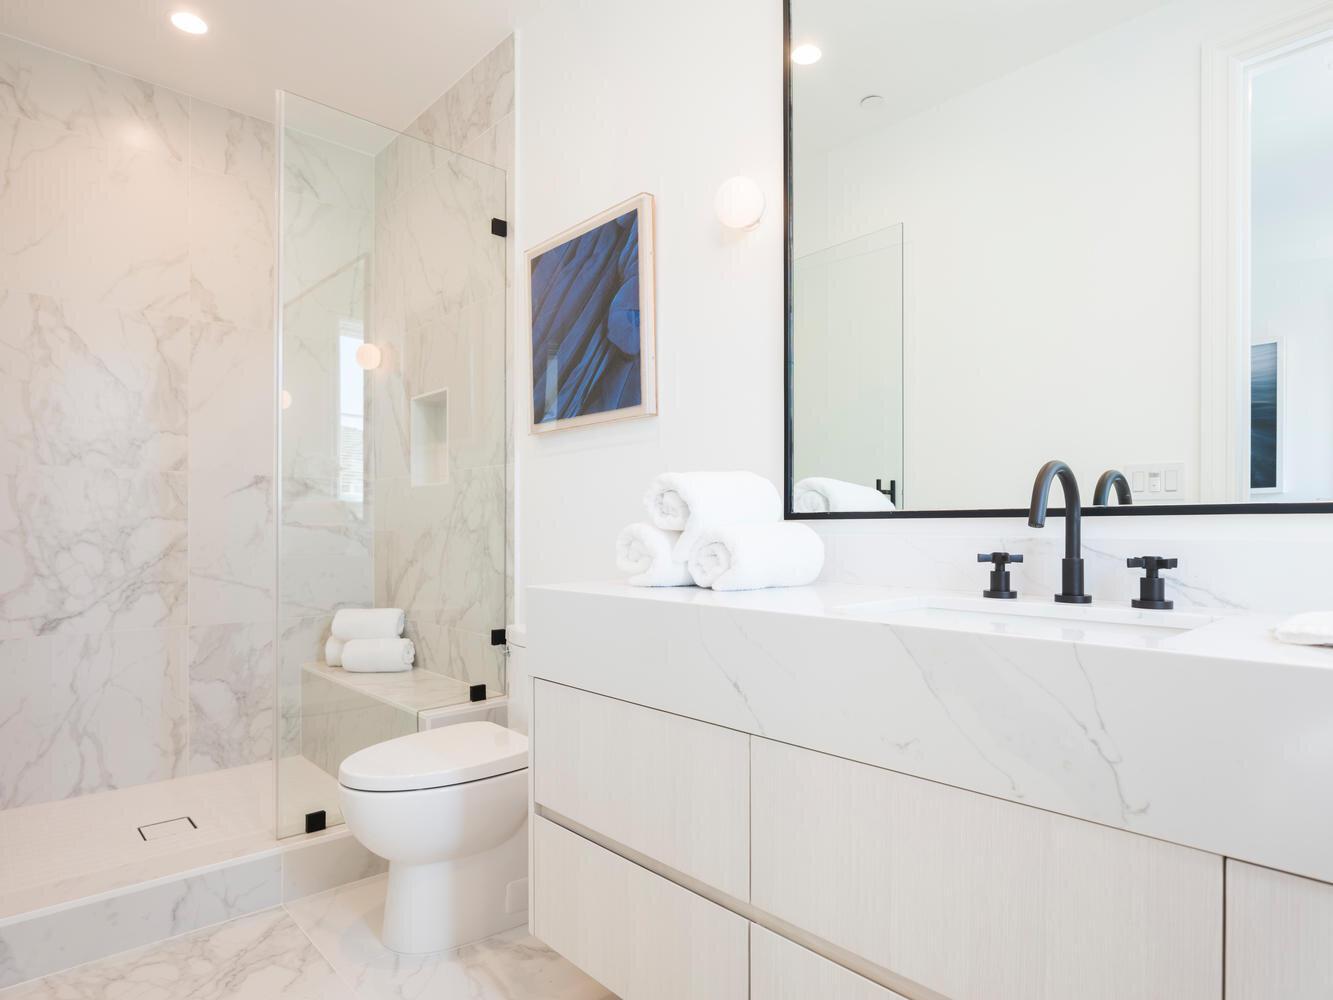 950 Kagawa St Pacific-large-041-037-Bathroom-1334x1000-72dpi.jpg